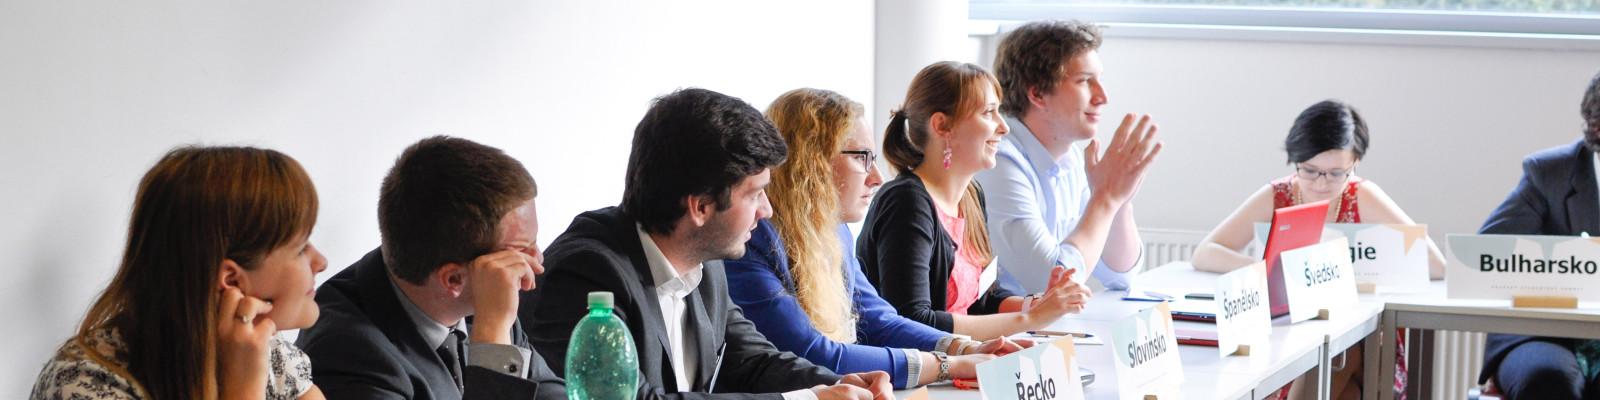 2nd preparatory meeting of XXII season of the Prague Student Summit